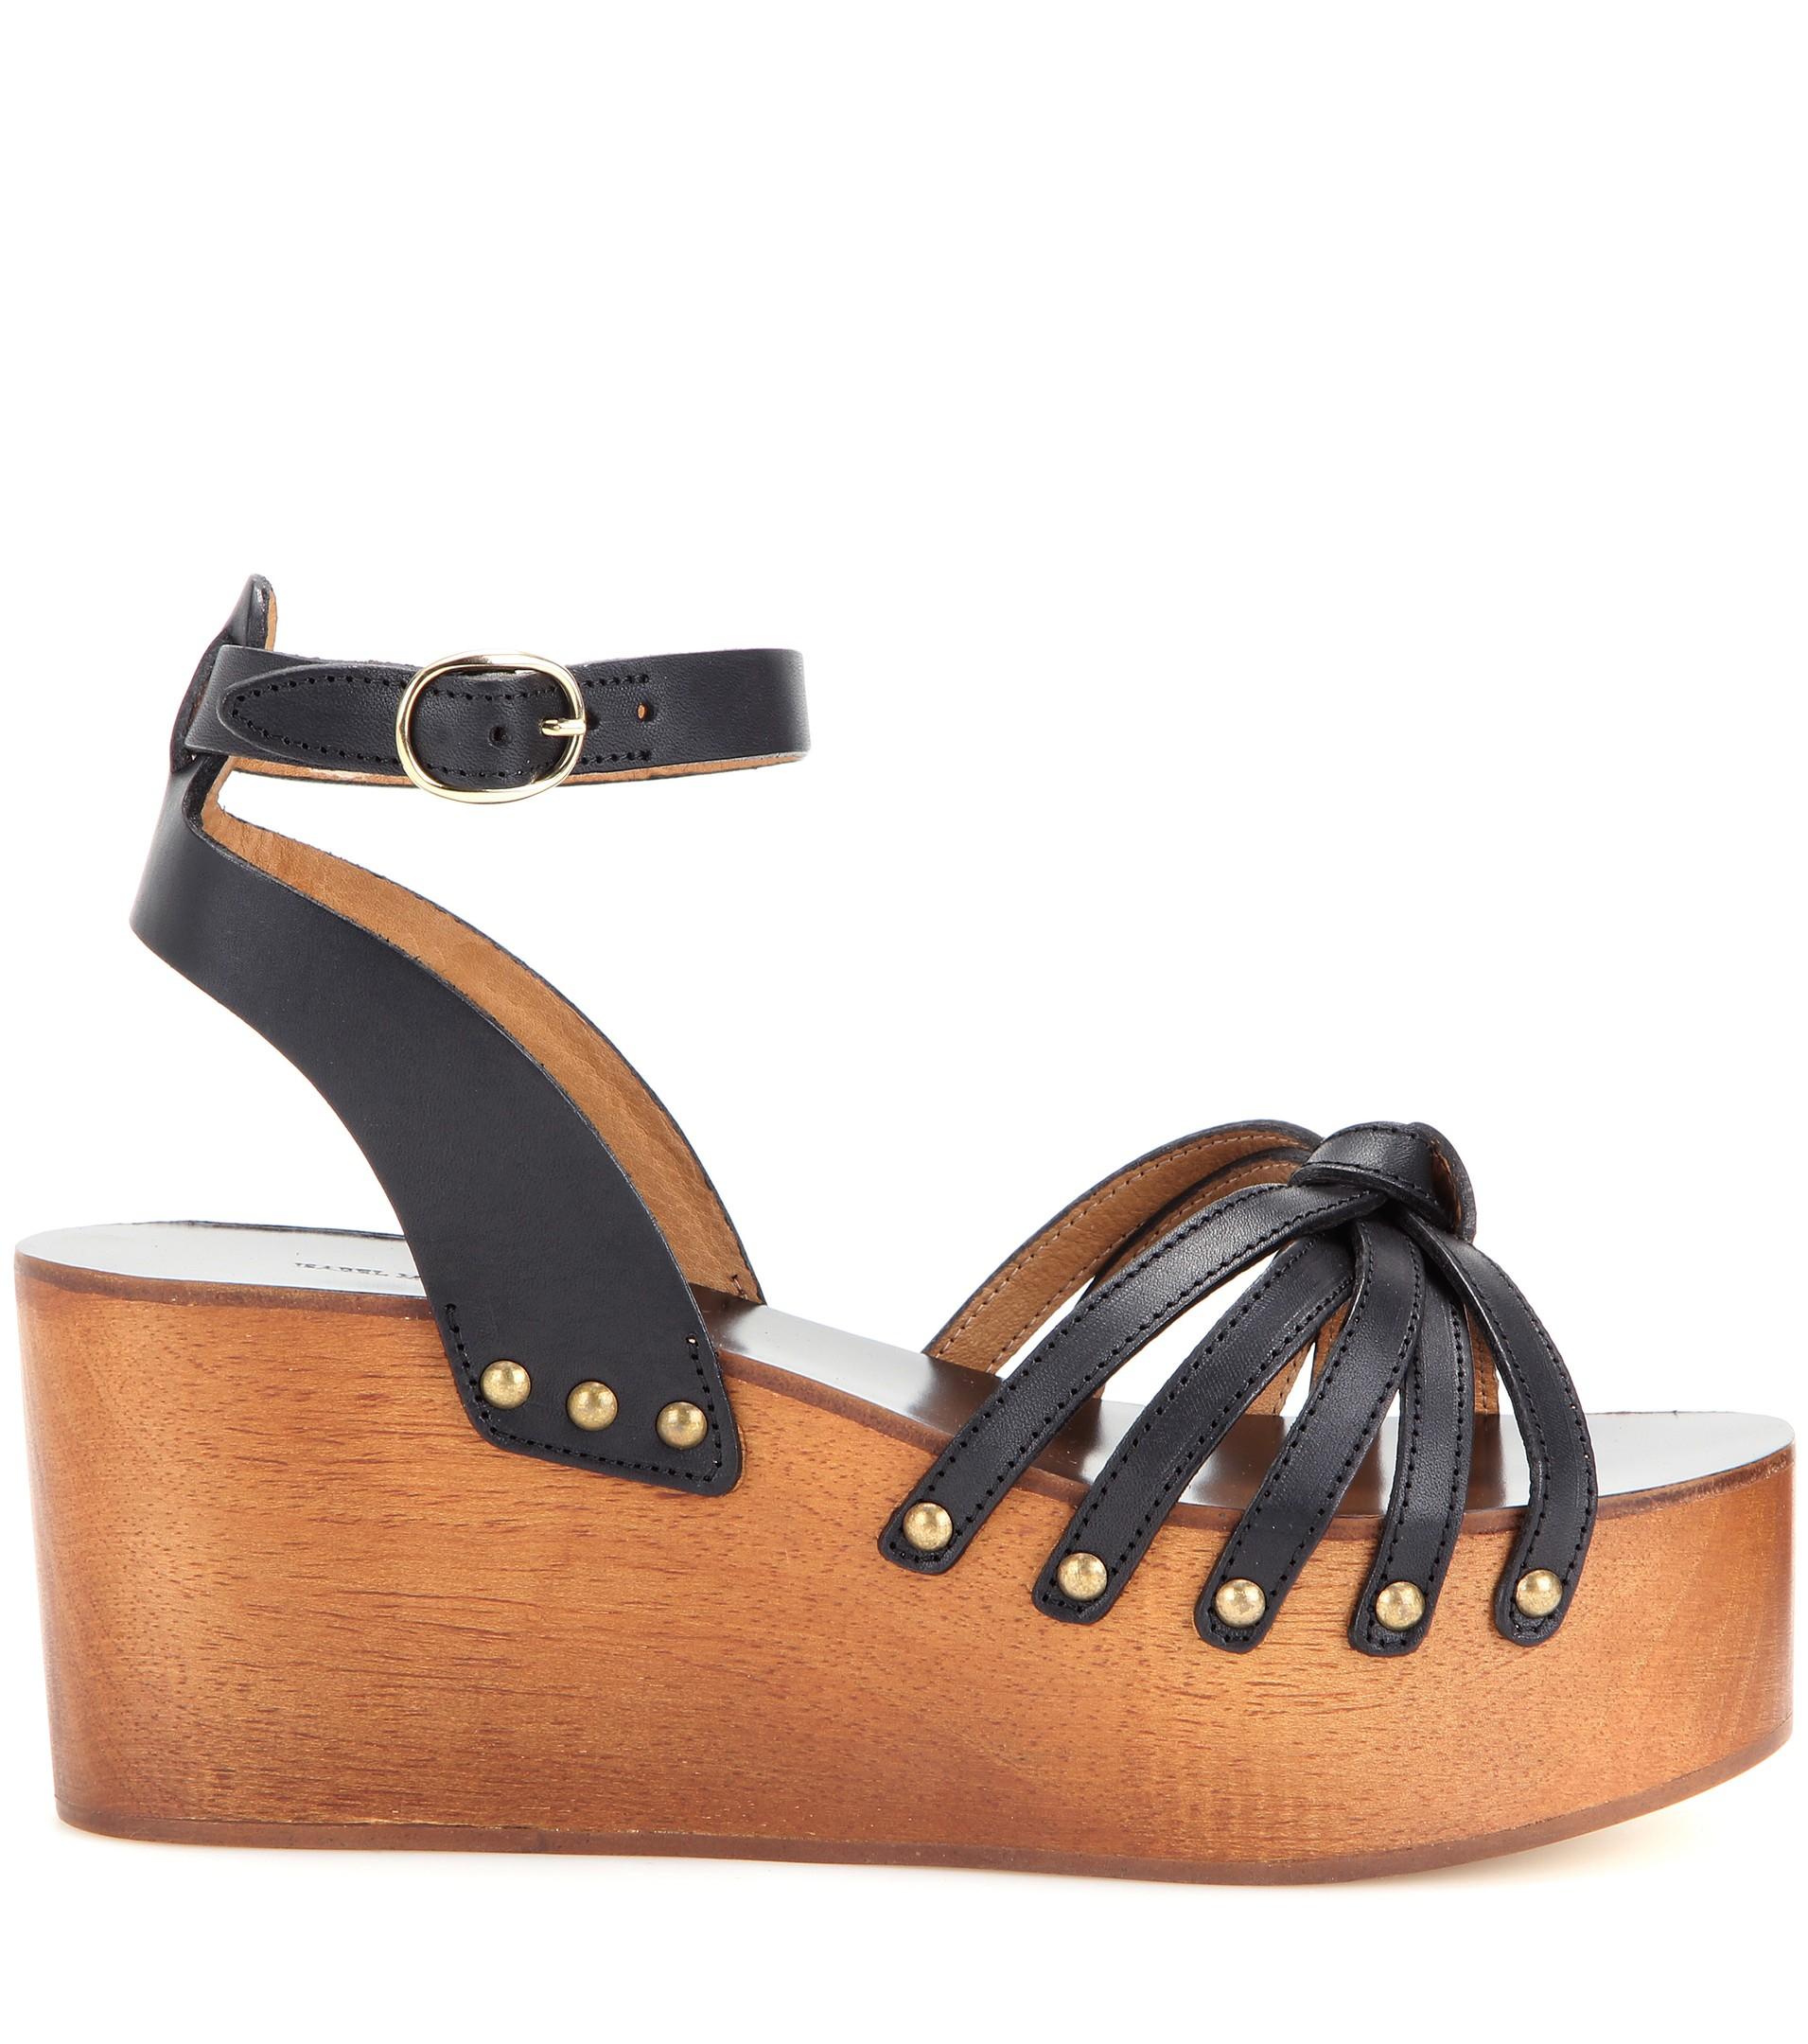 b5ad0fe44c1 Isabel Marant Étoile Zia Leather Platform Sandals in Black - Lyst